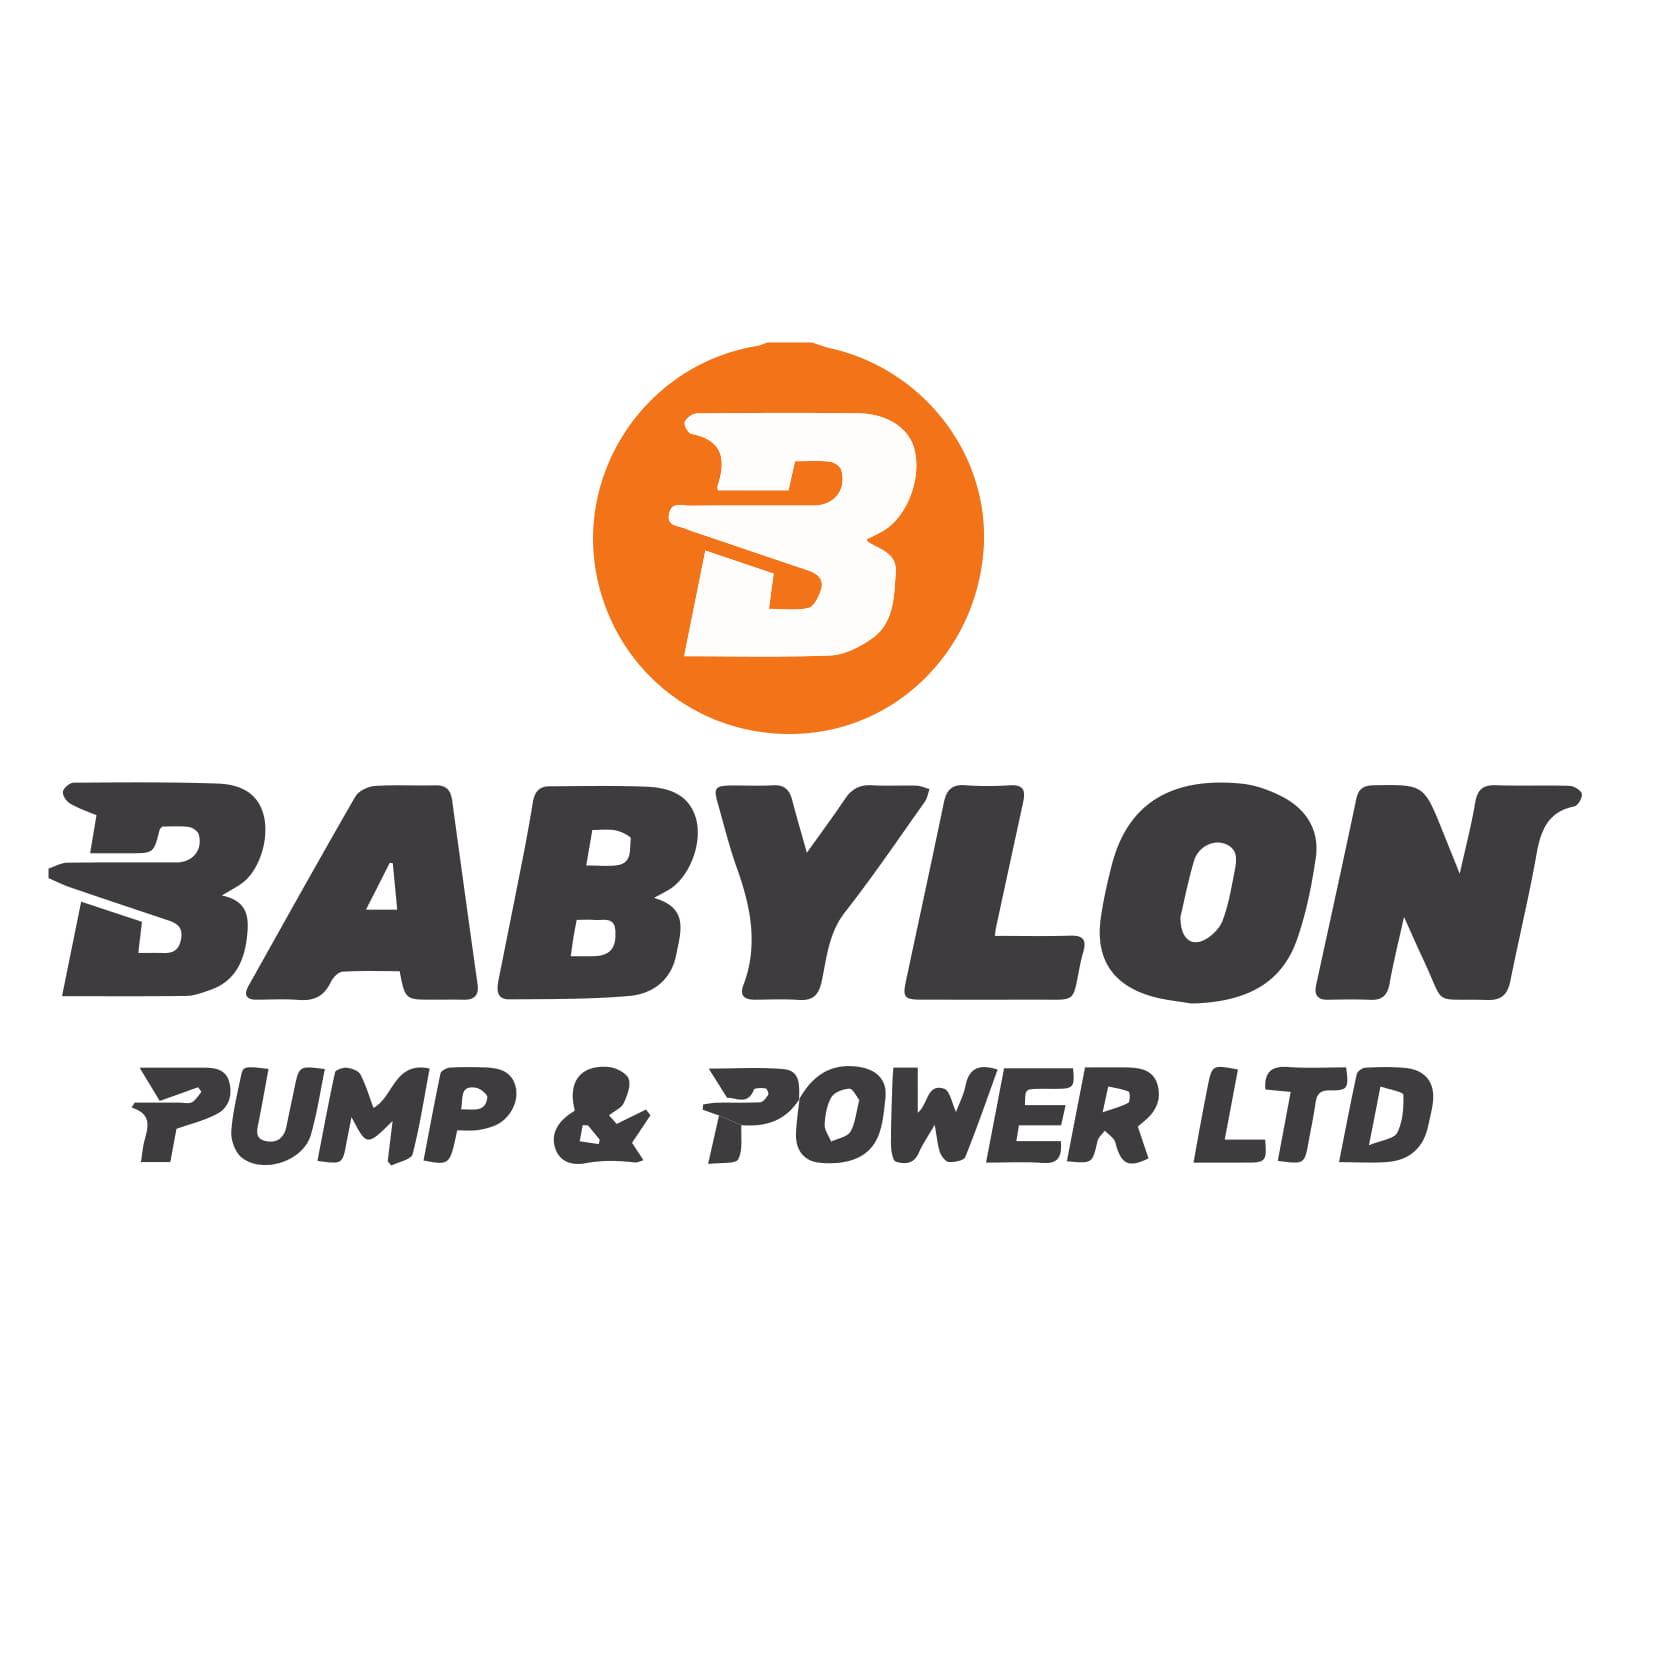 Babylon Pump & Power LTD